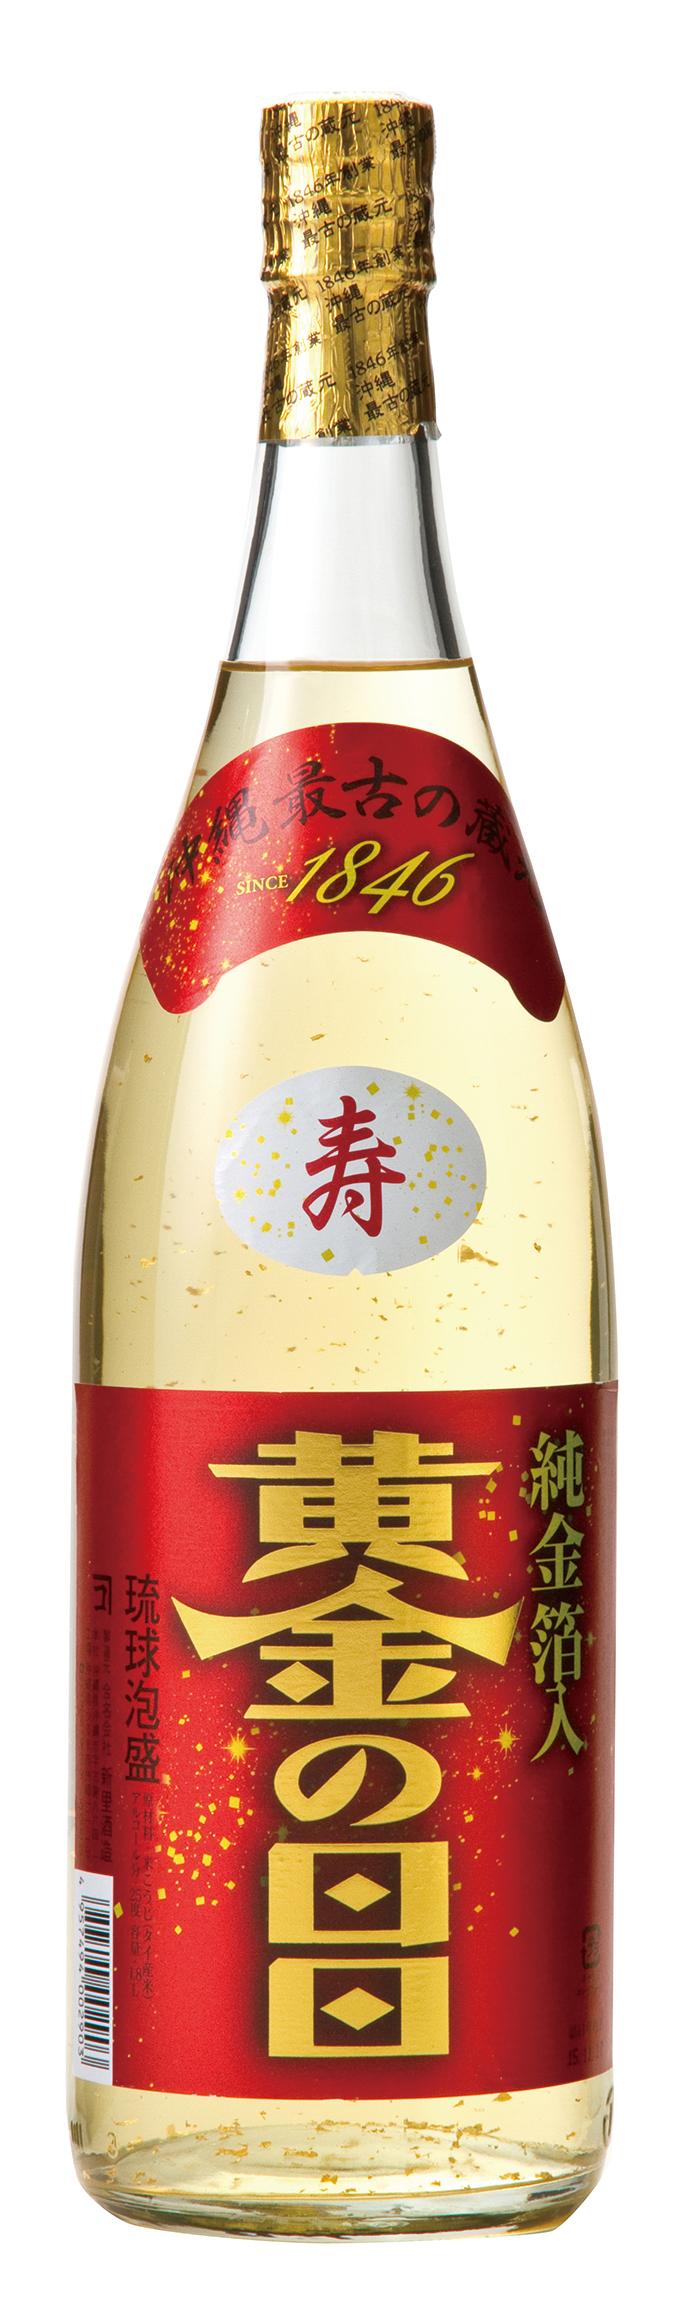 新里酒造 黄金の日日  25度 1800ml